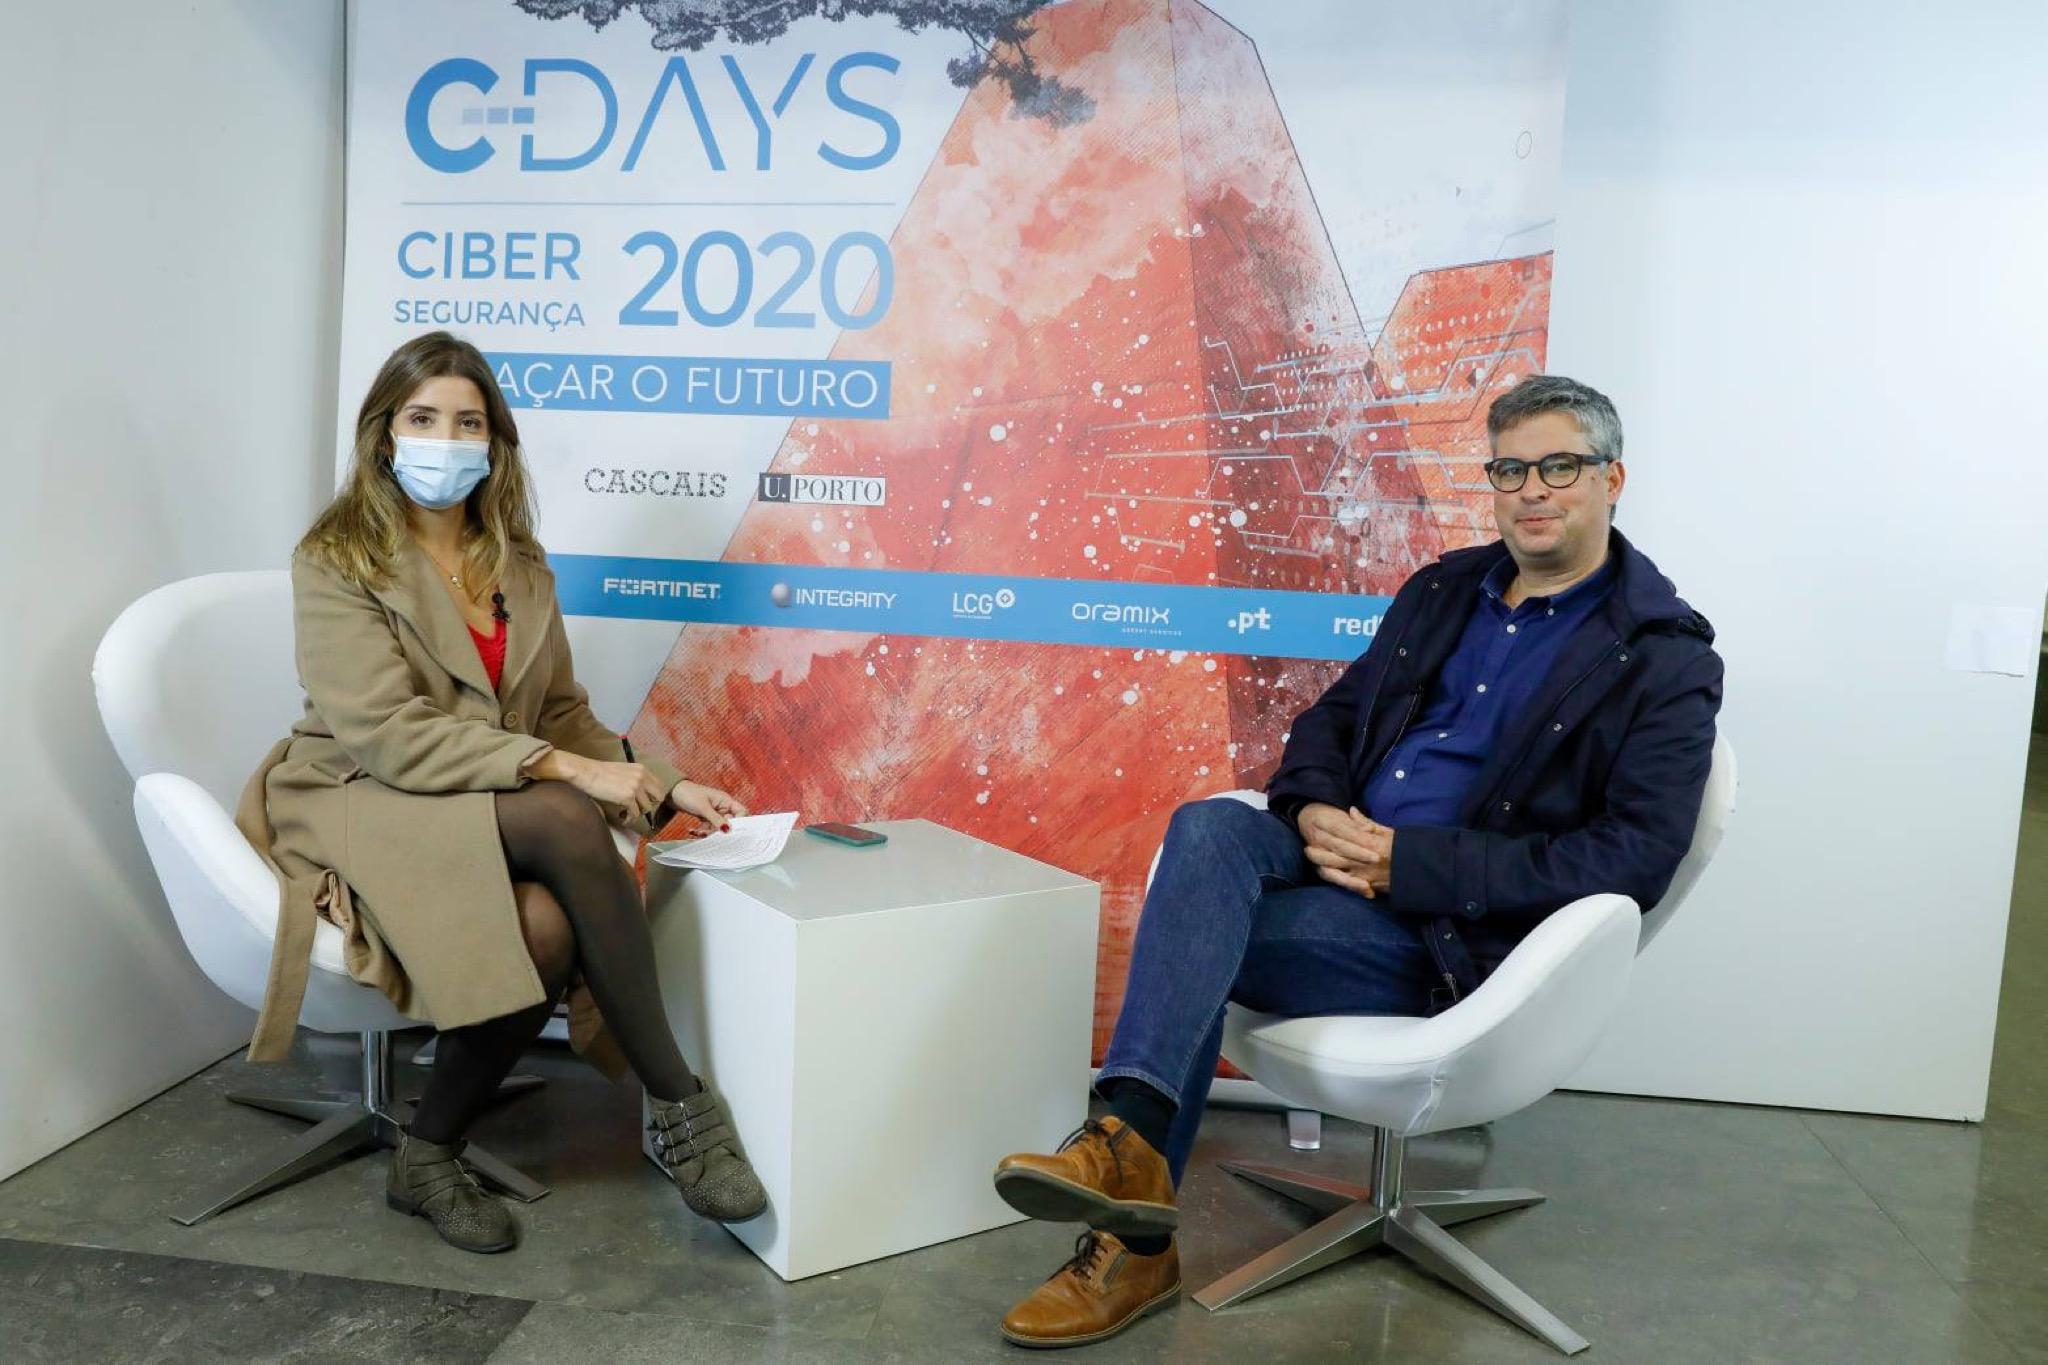 https://www.c-days.cncs.gov.pt/wp-content/uploads/2021/04/Dia26_entrevista.jpeg